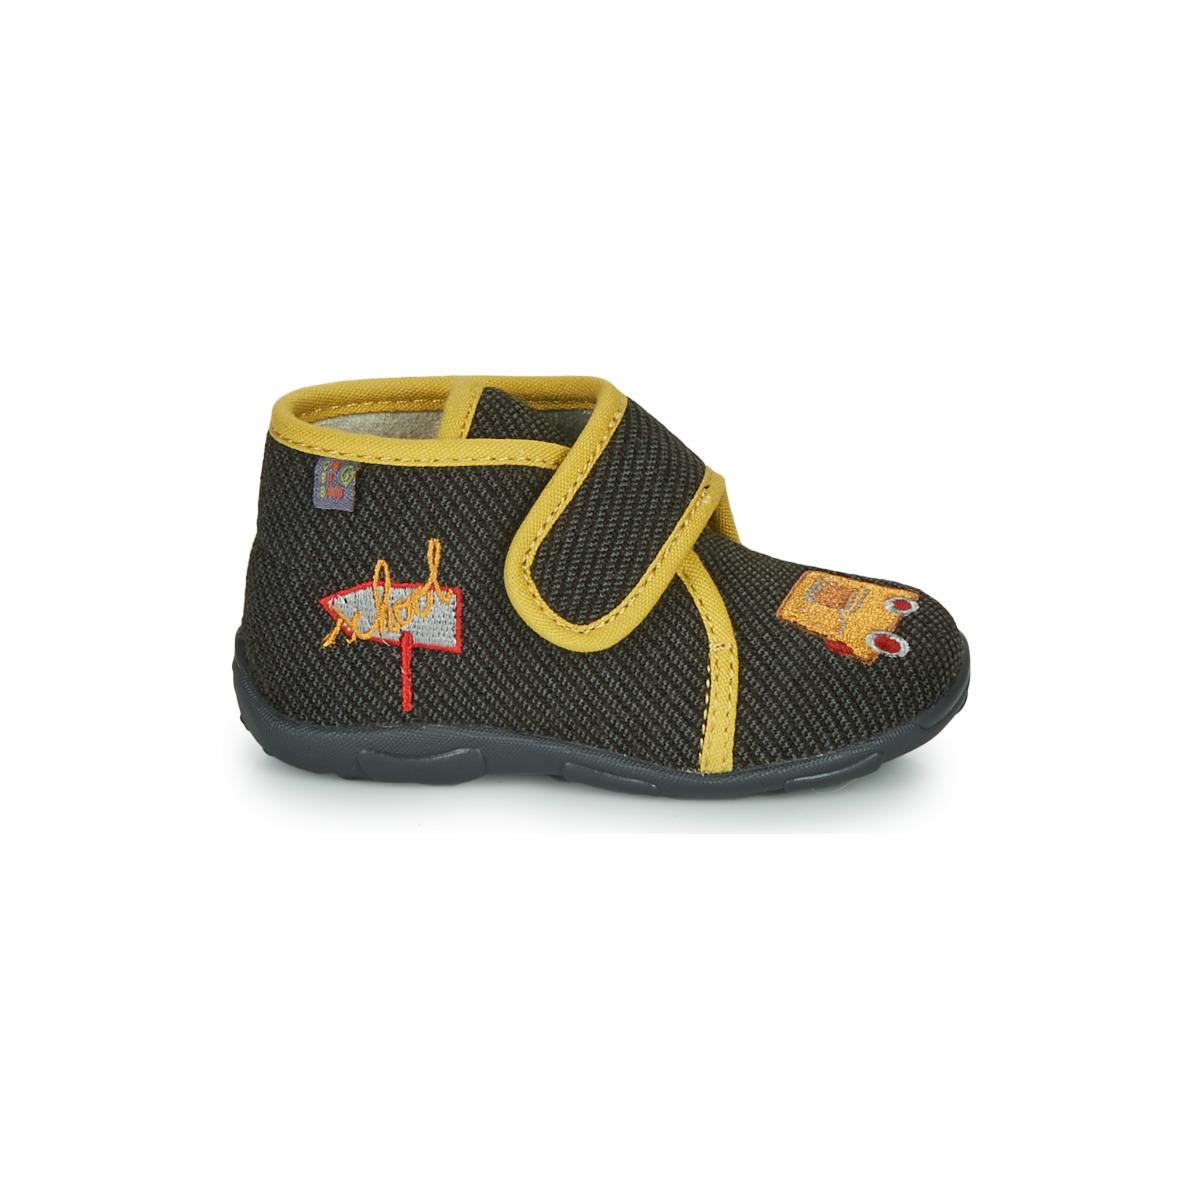 Chaussons enfant garcons gbb okandi noir